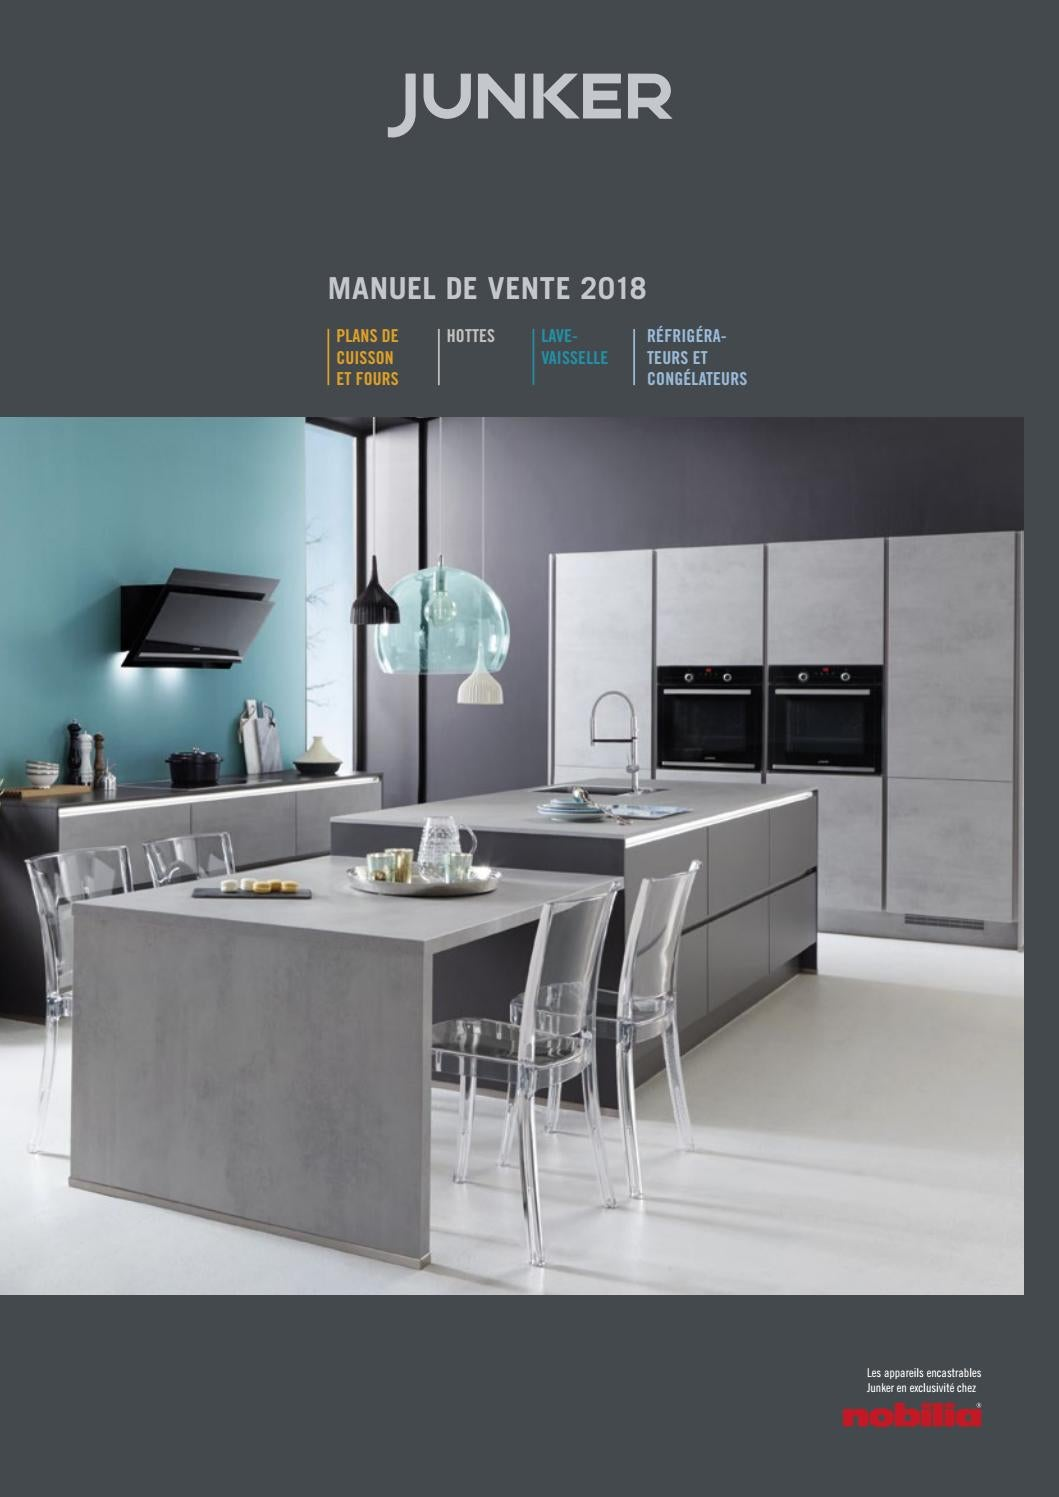 Hotte Avec Micro Onde Intégré junker manuel de vente 2018junker einbaugeräte - issuu